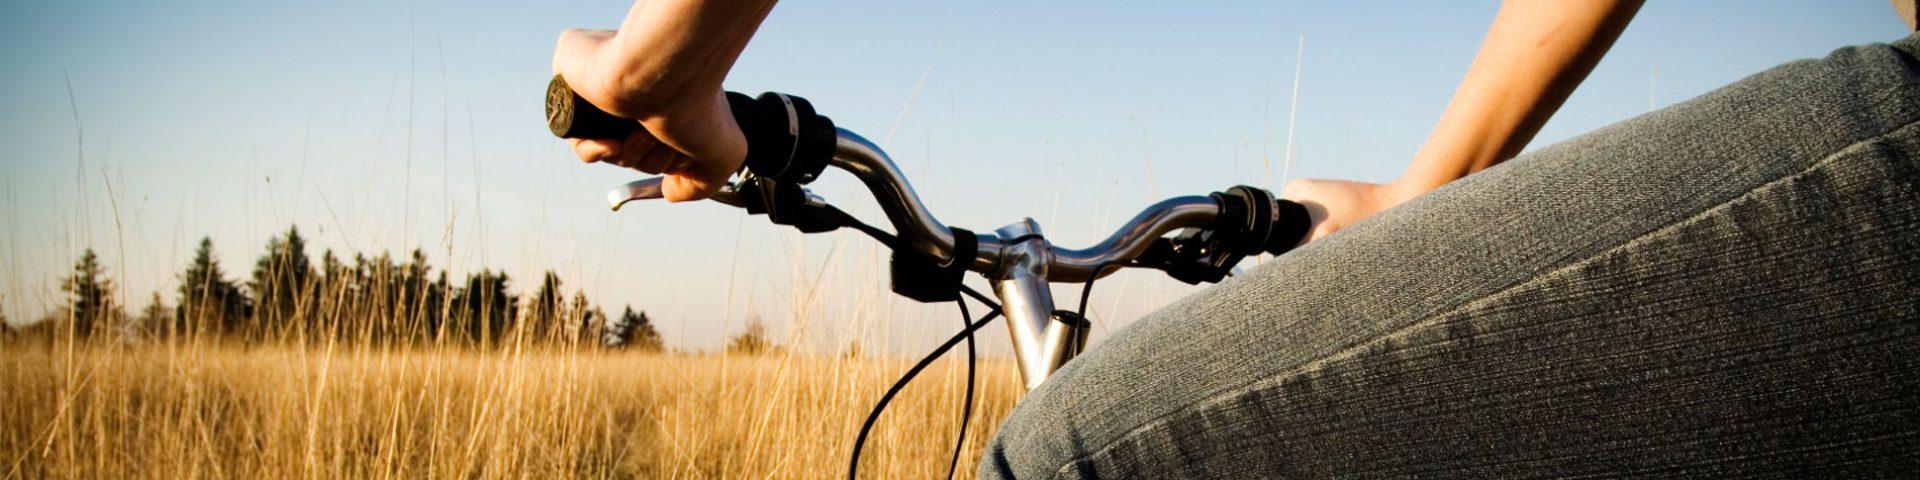 Gite in Mountain Bike